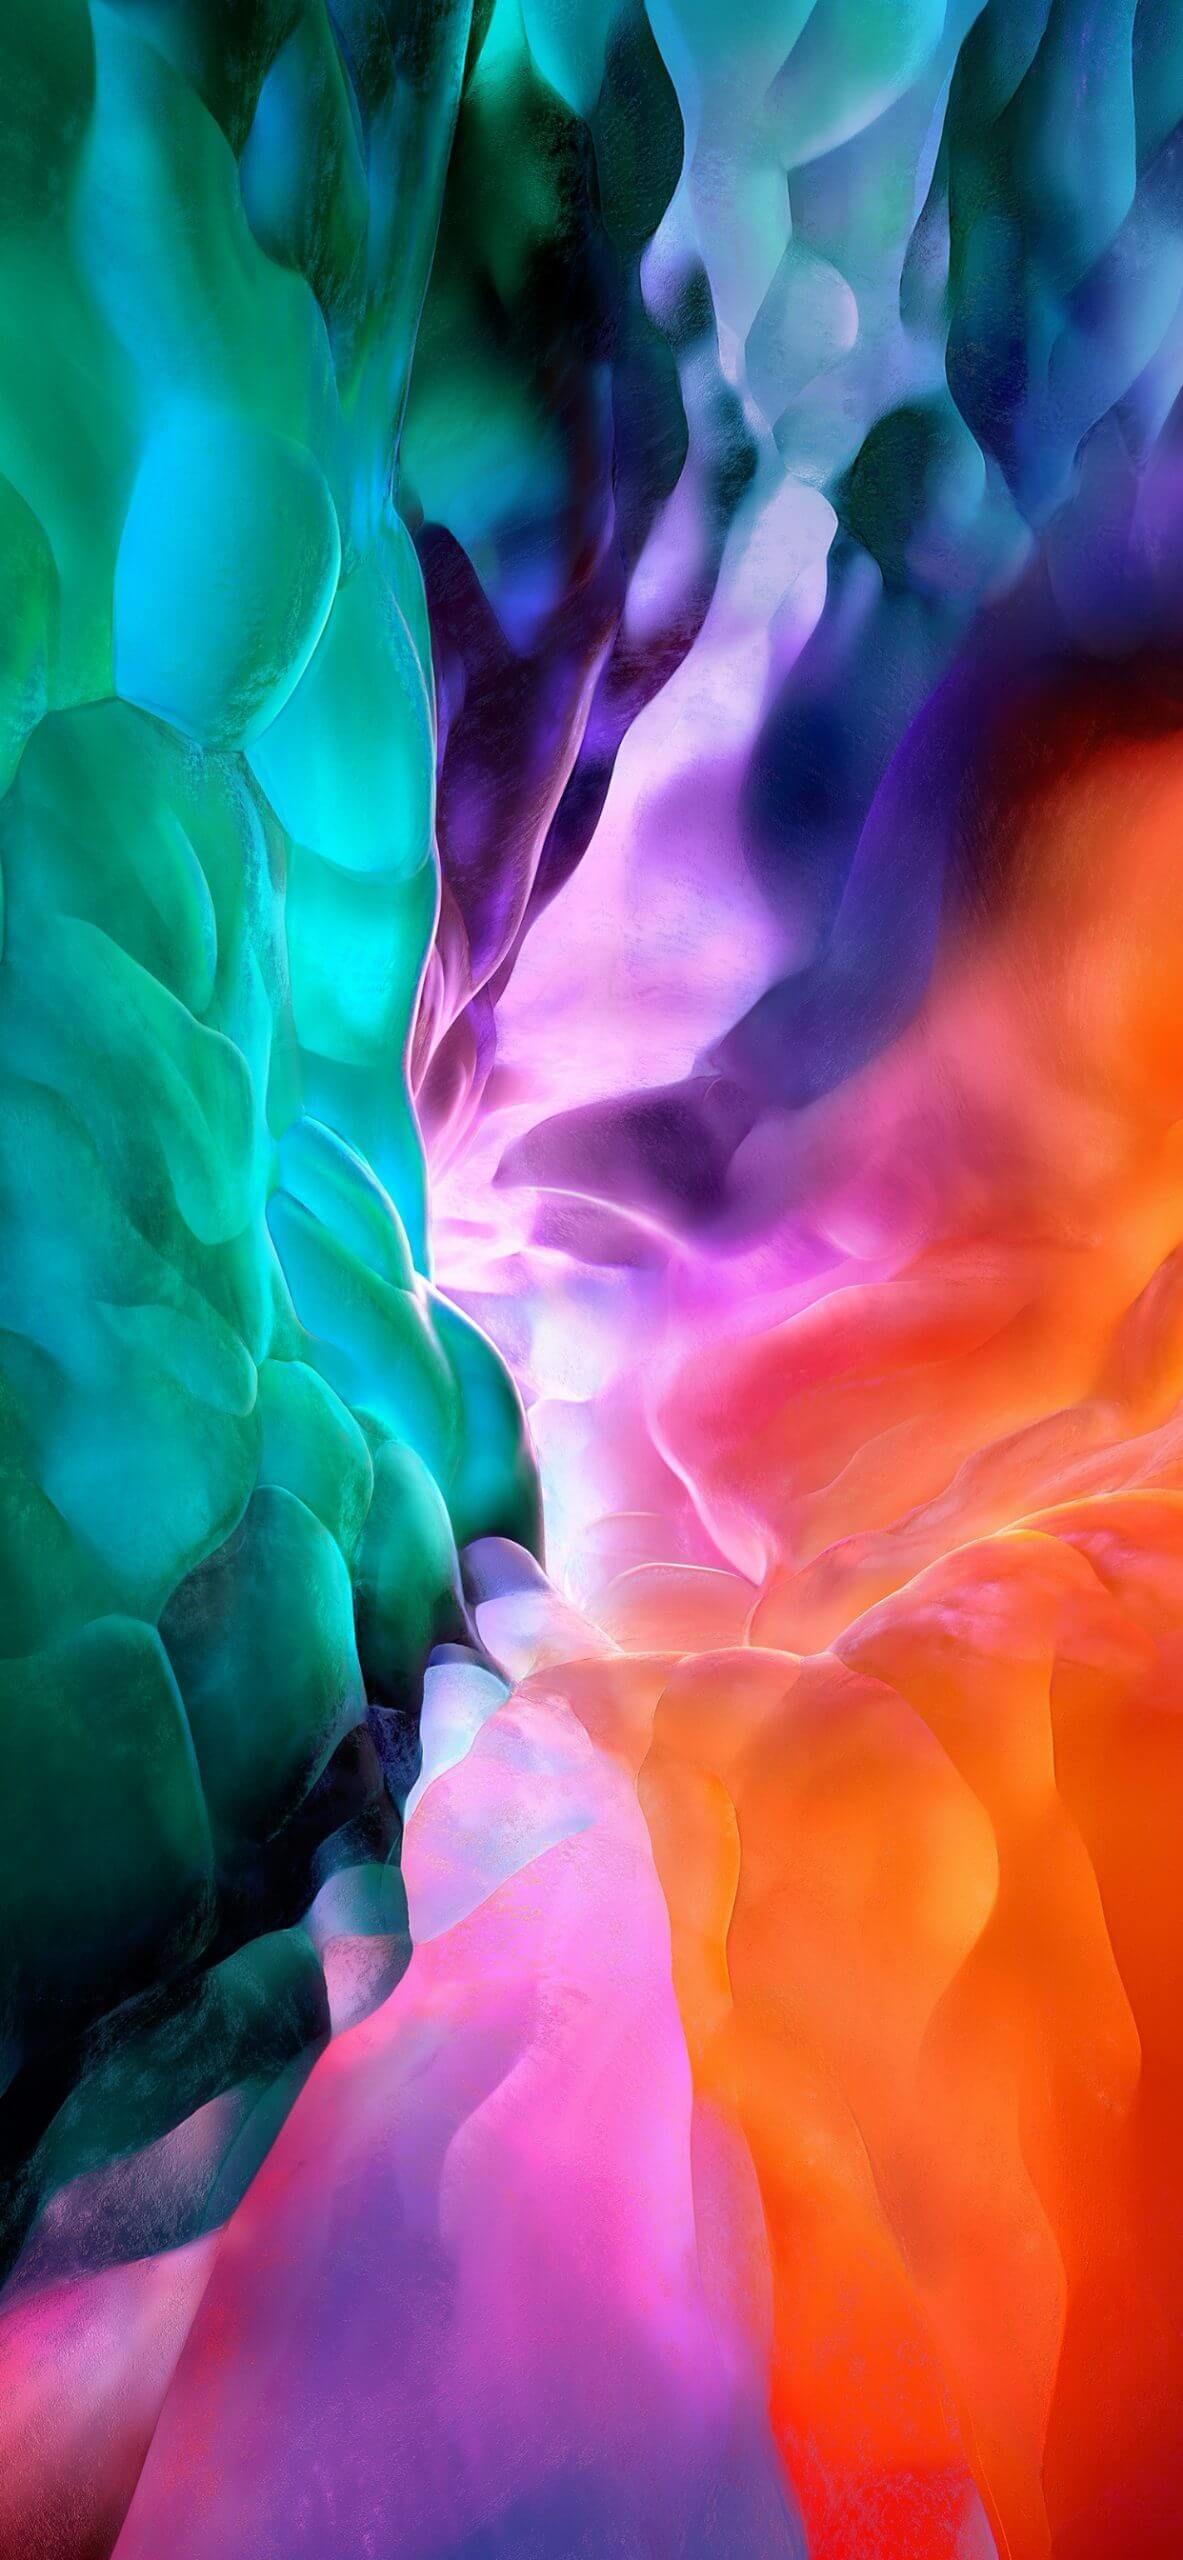 Download Ipad Pro 2020 Wallpapers Igeeksblog In 2021 Ipad Pro Wallpaper Ipad Pro Wallpaper Hd Ipad Wallpaper